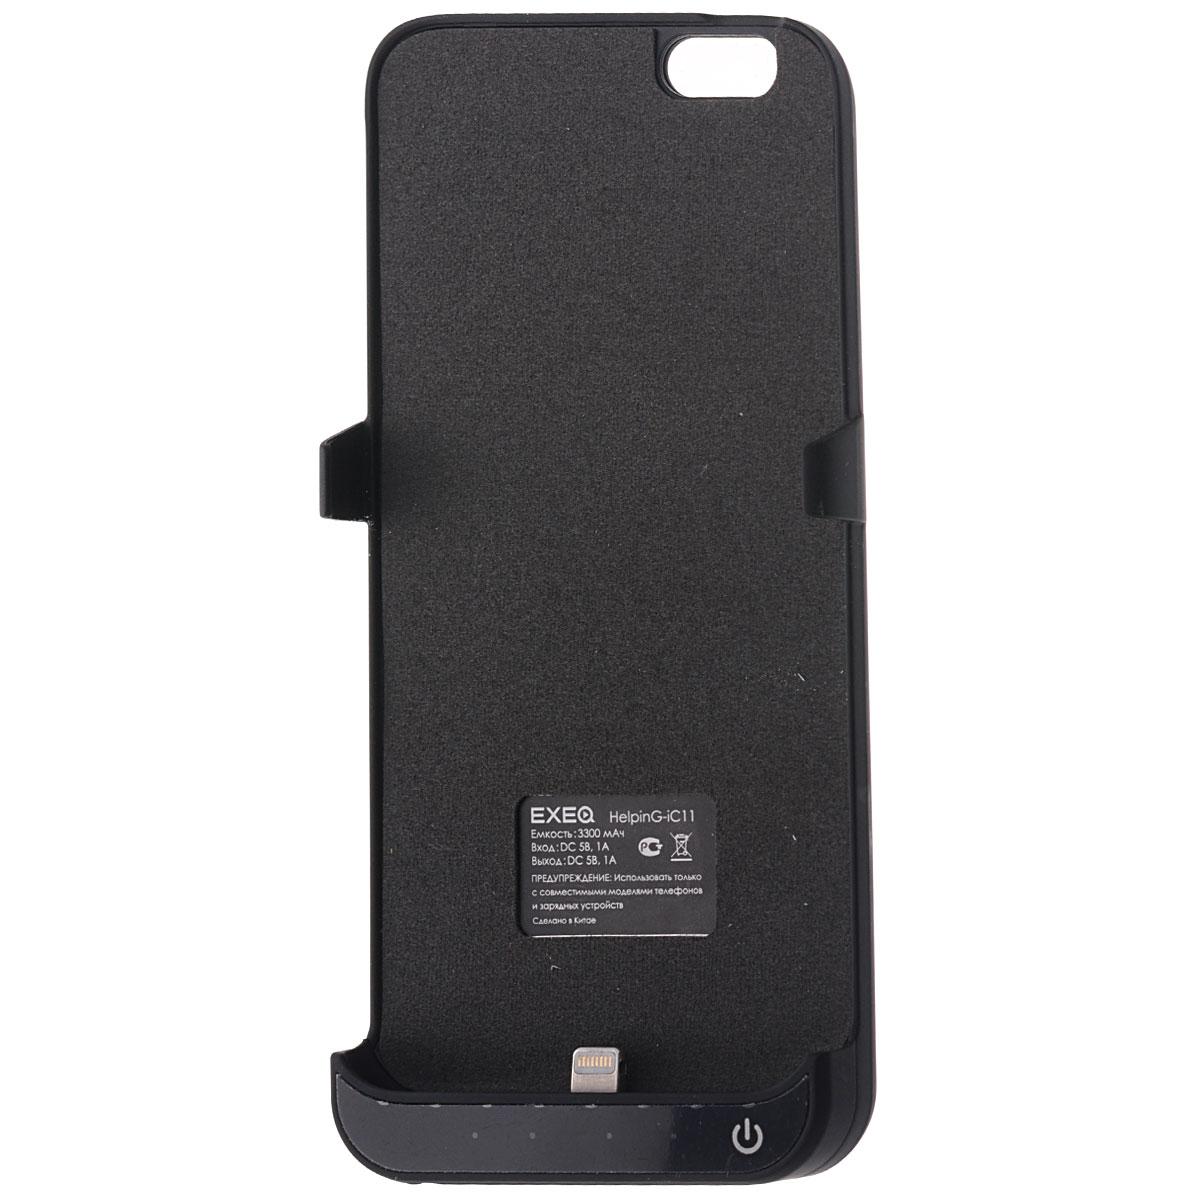 EXEQ HelpinG-iC11 чехол-аккумулятор для iPhone 6, Black (3300 мАч, клип-кейс)